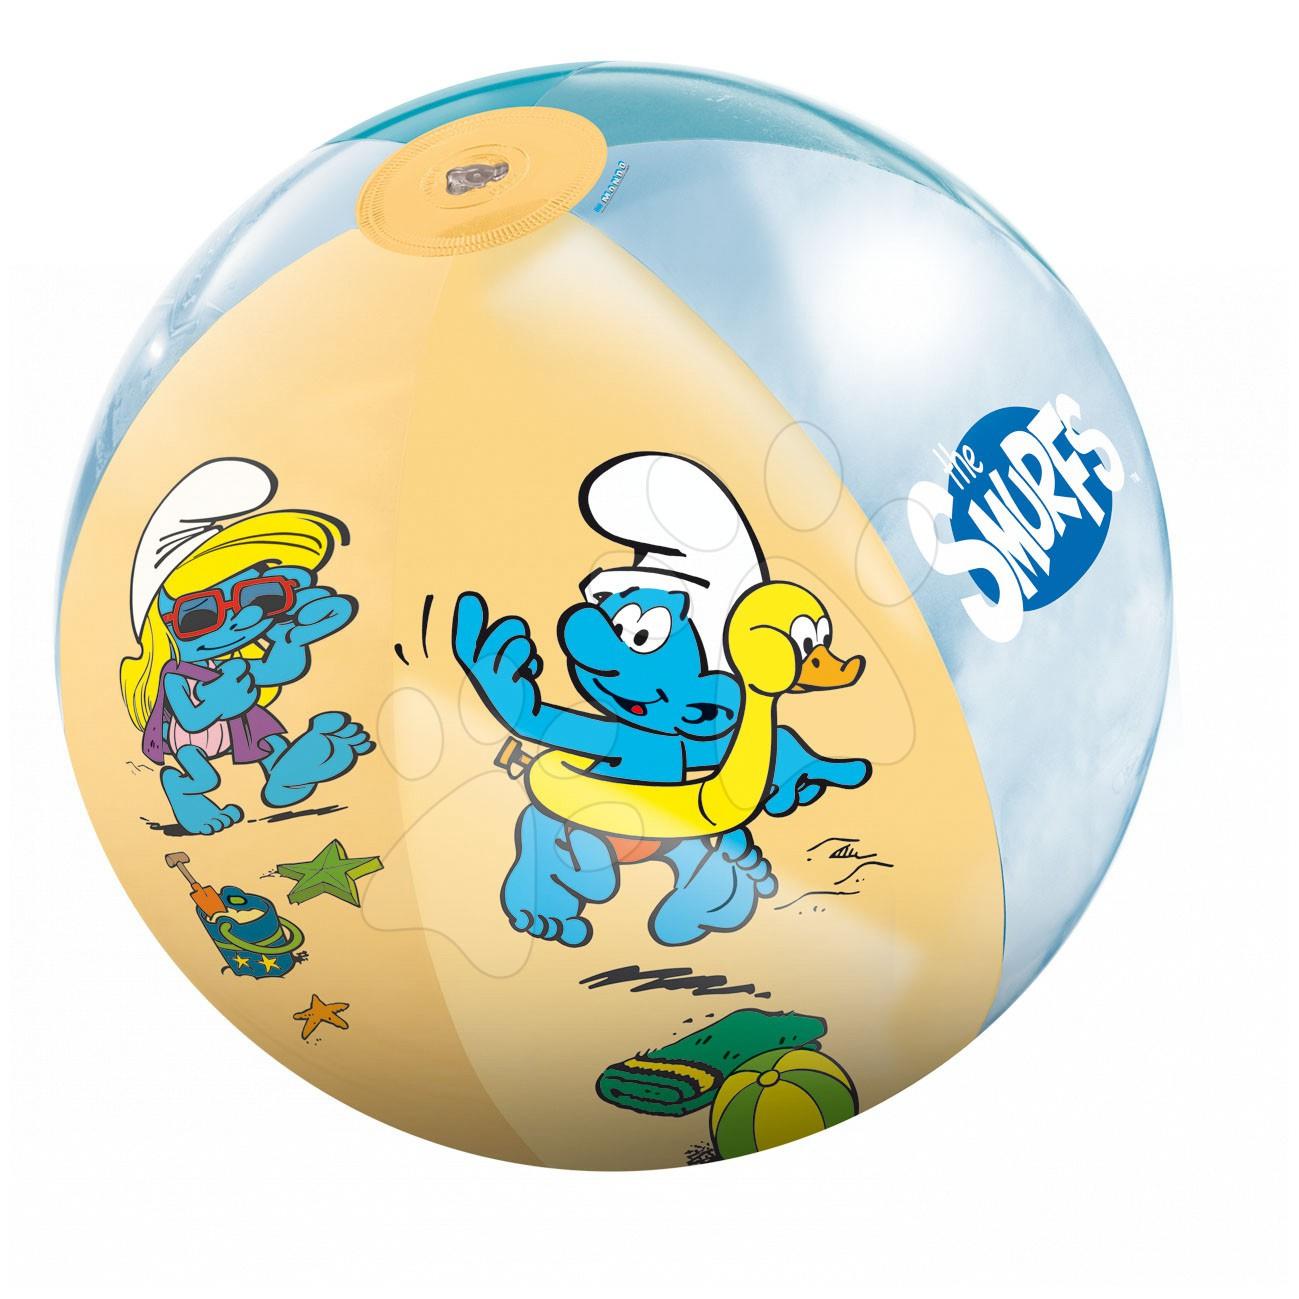 Minge de plajă gonflabilă  Smurfs Mondo 50 cm